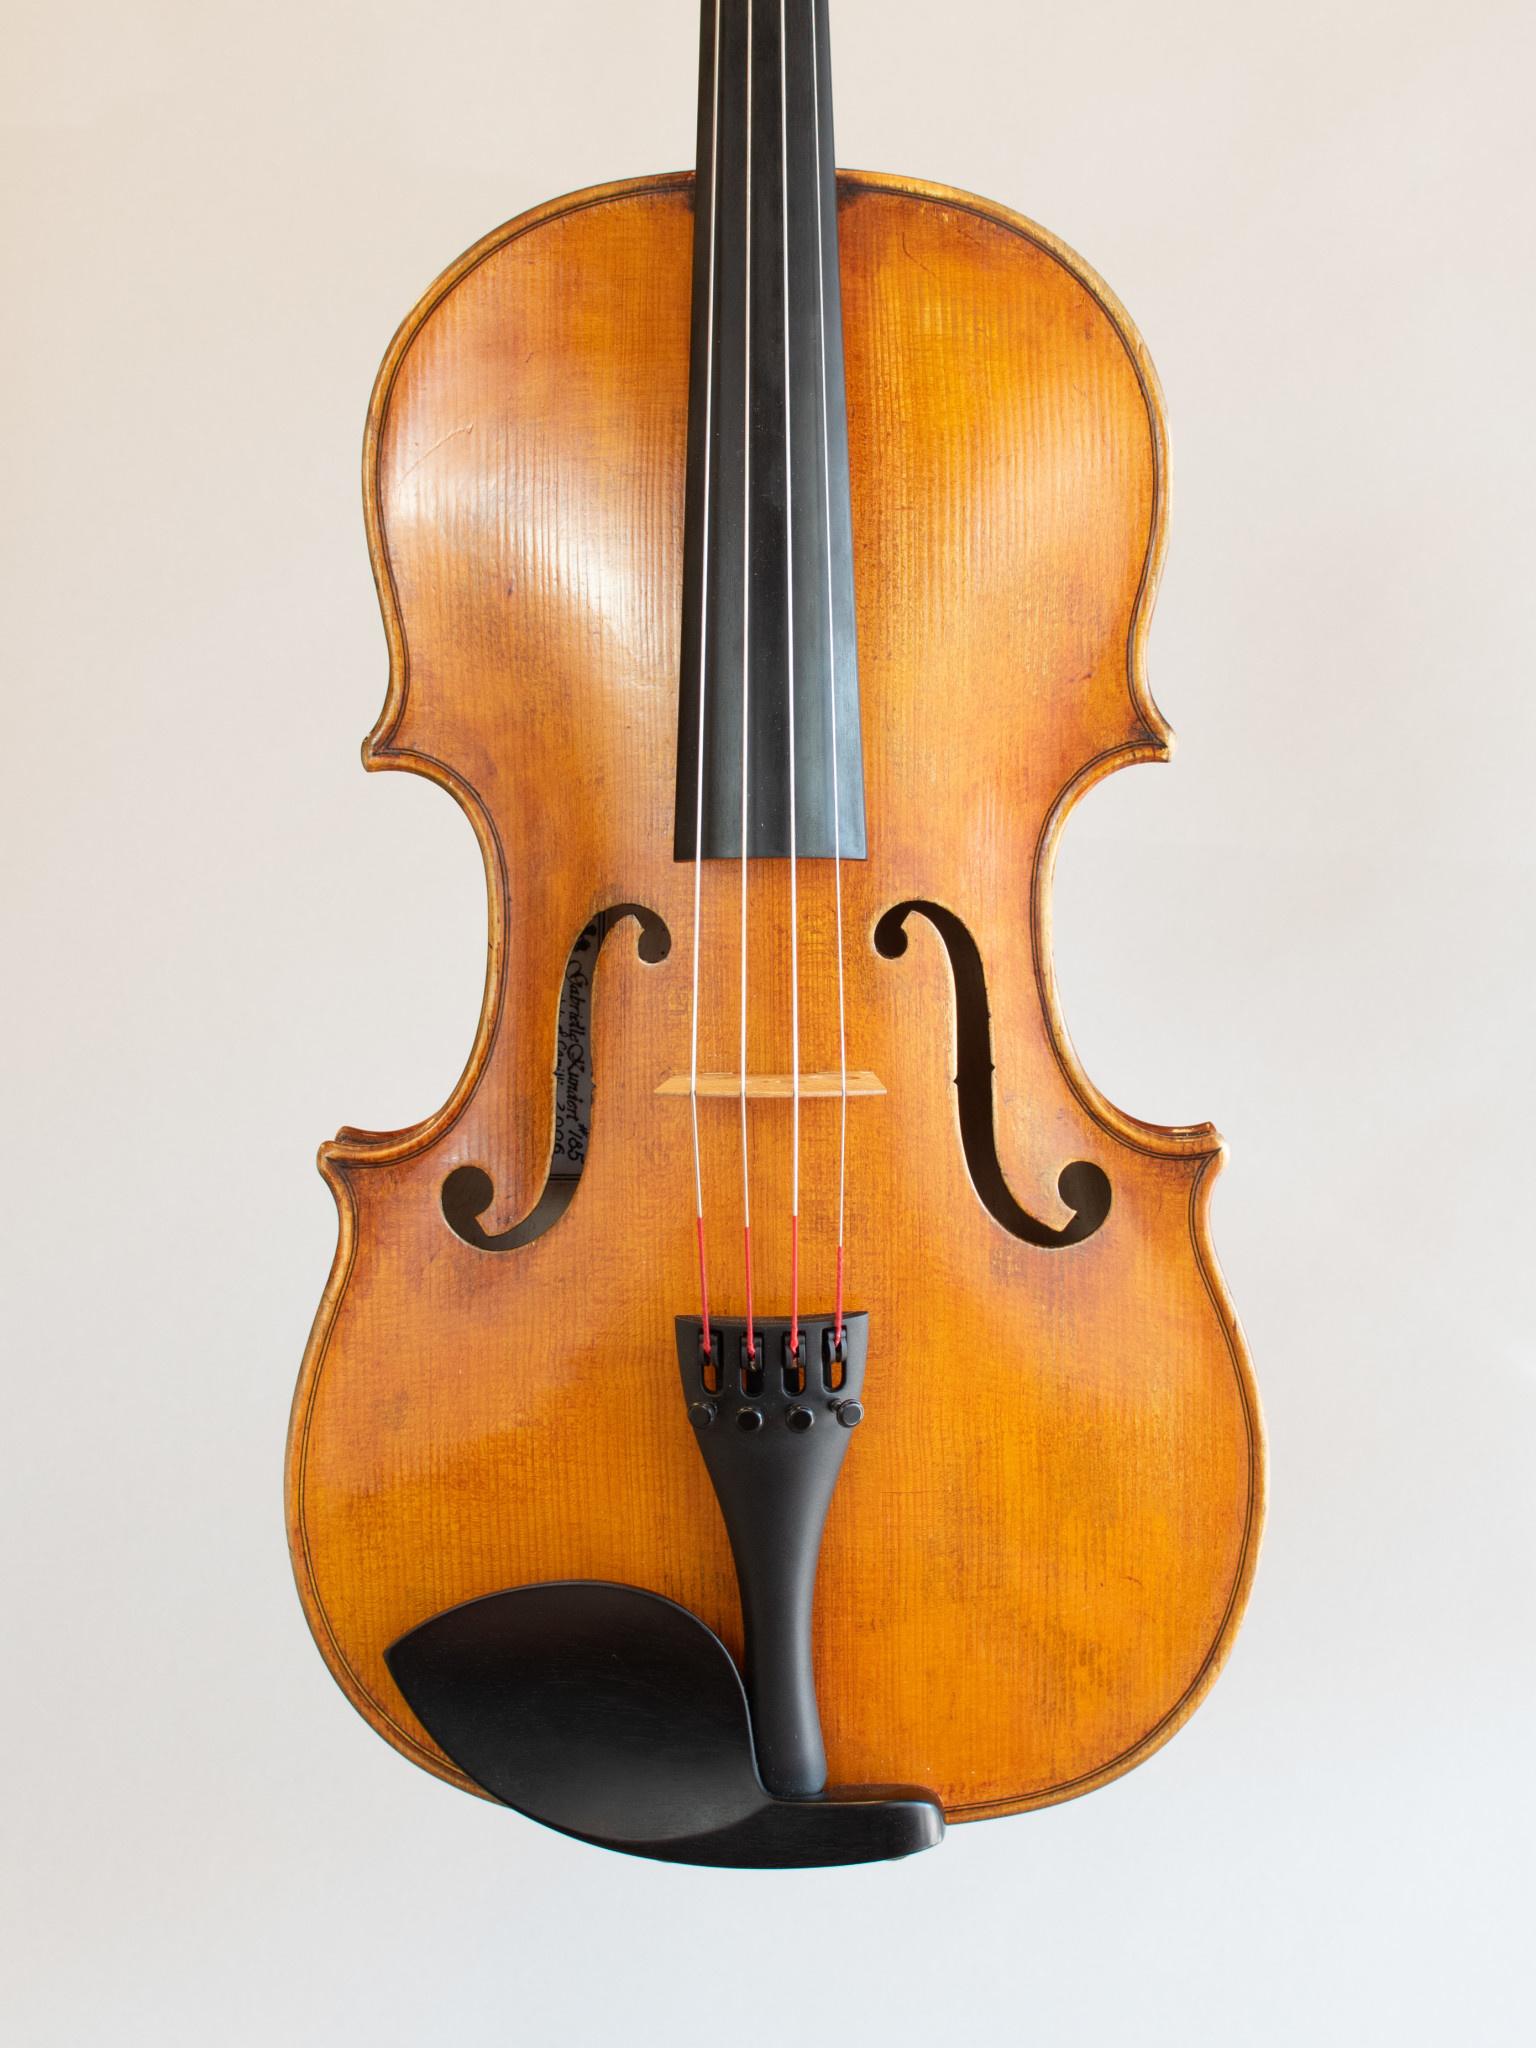 "16 1/8"" Gabrielle Kundert viola, #185, 2006"